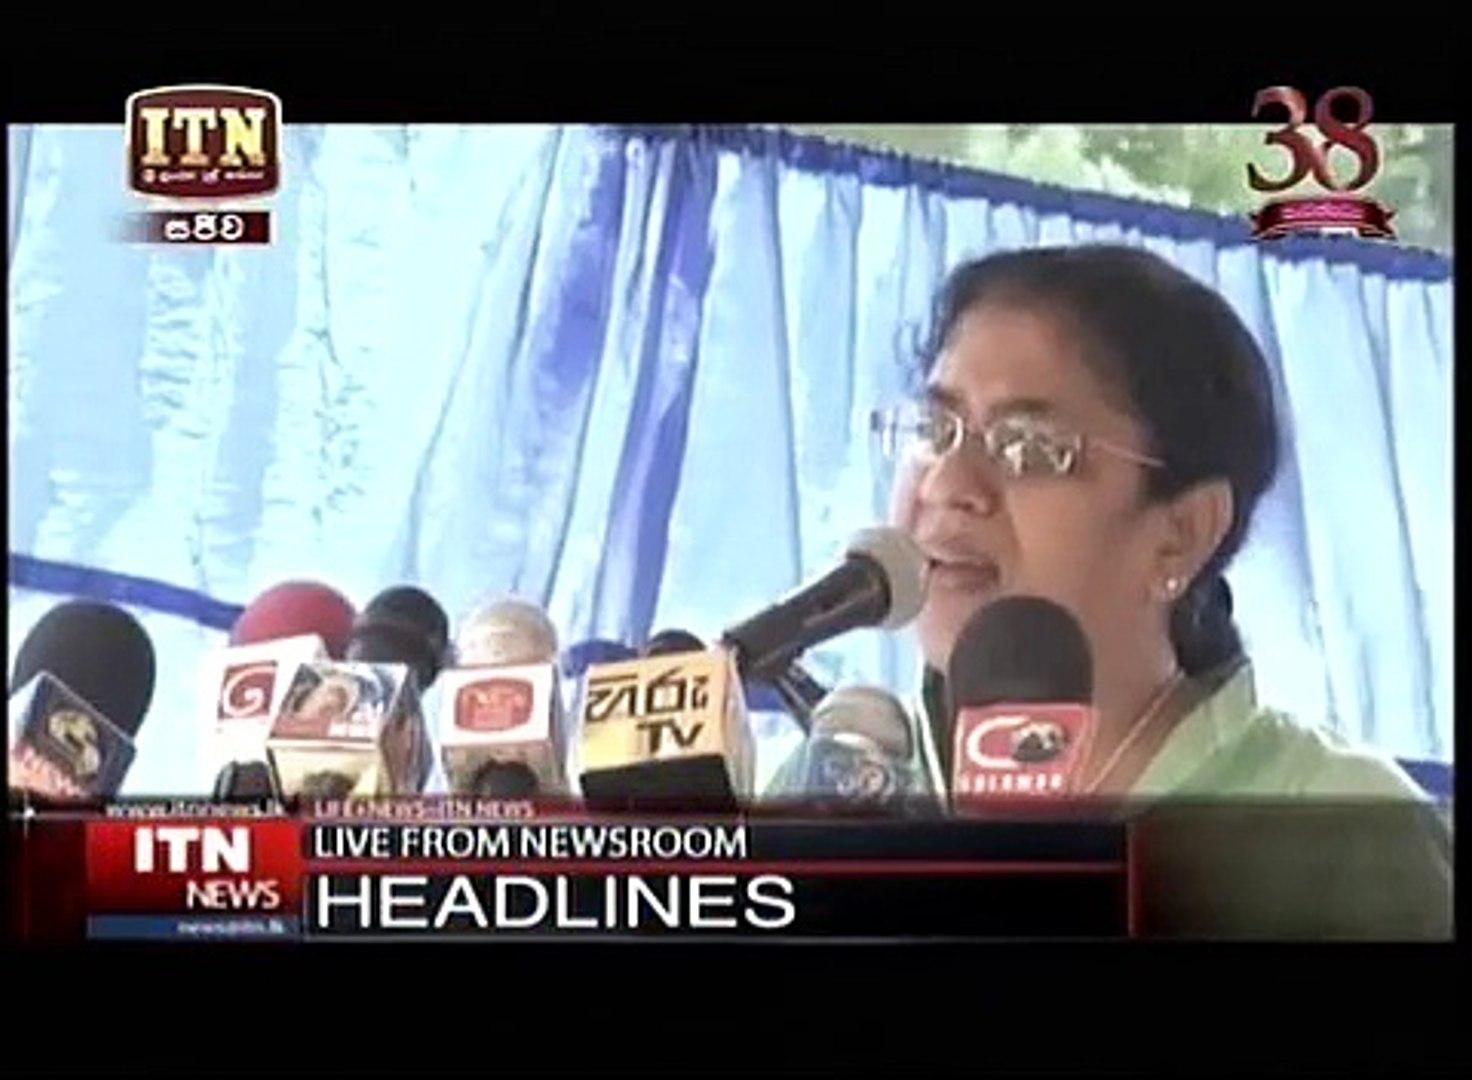 ITN news 9,30 - video dailymotion